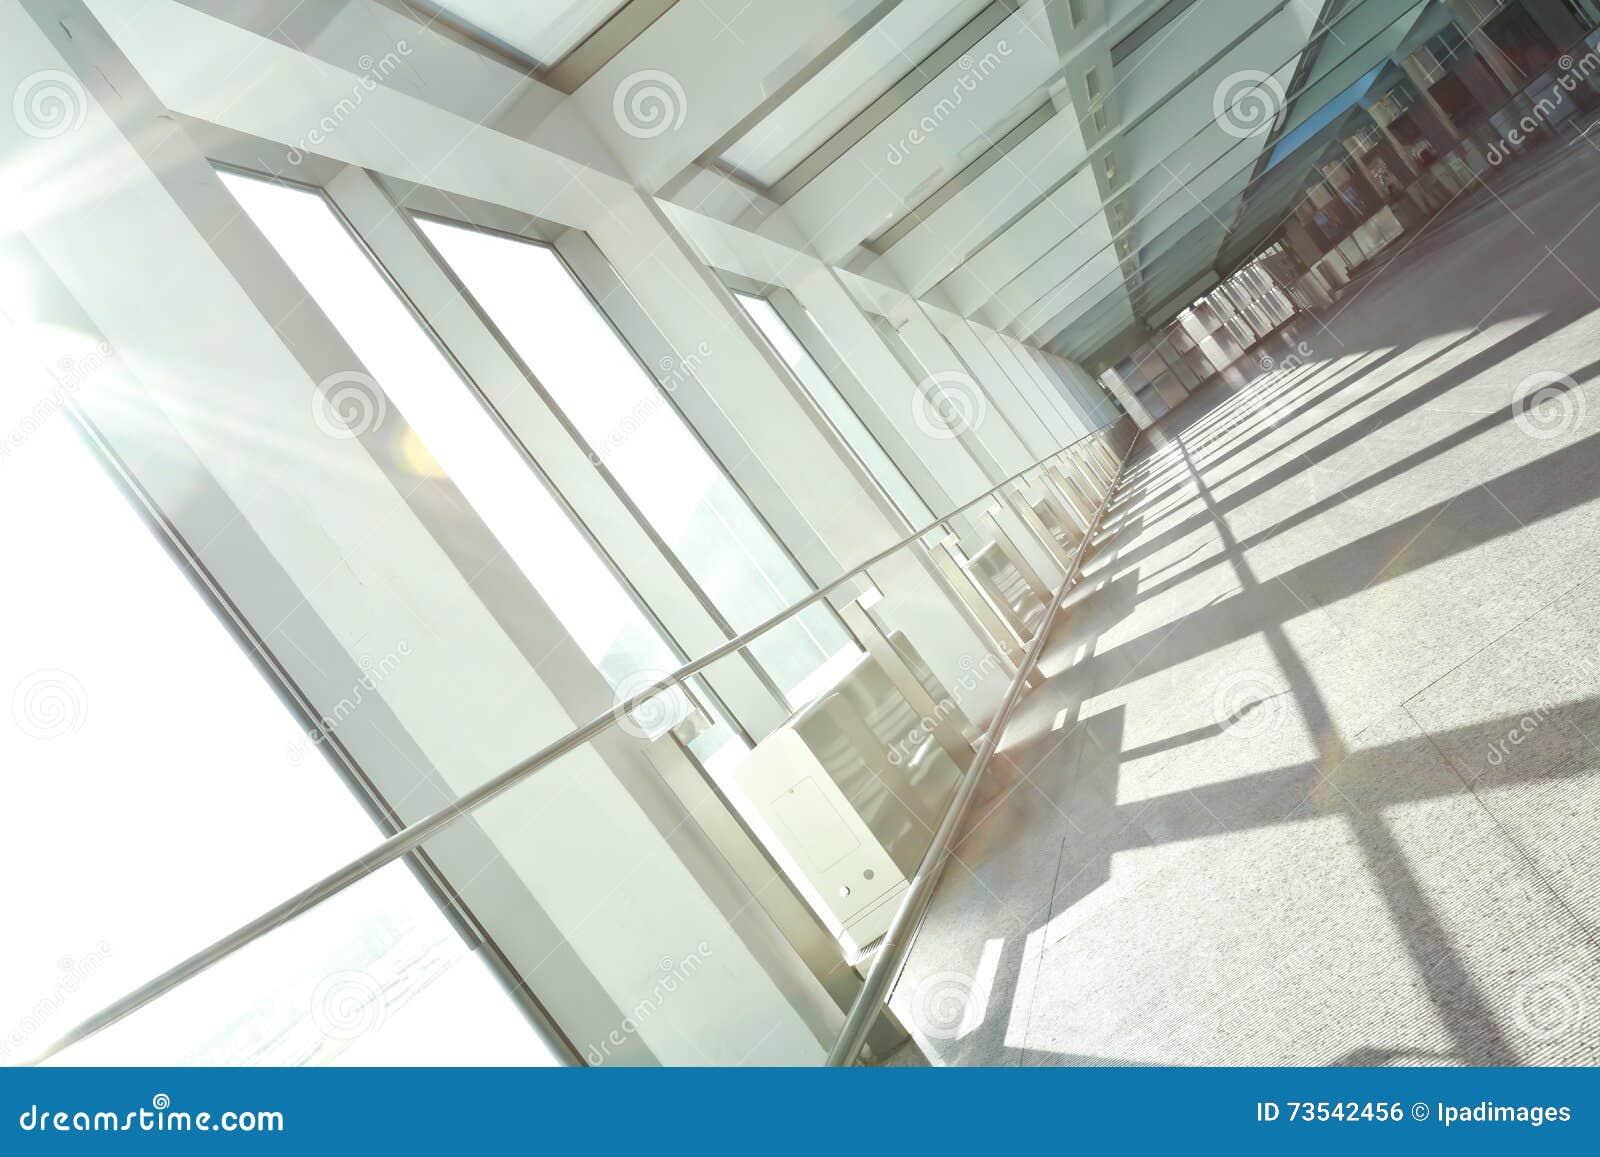 Glass office windows - Sunny On Modern Glass Office Windows Building Interior Corridor Stock Photo